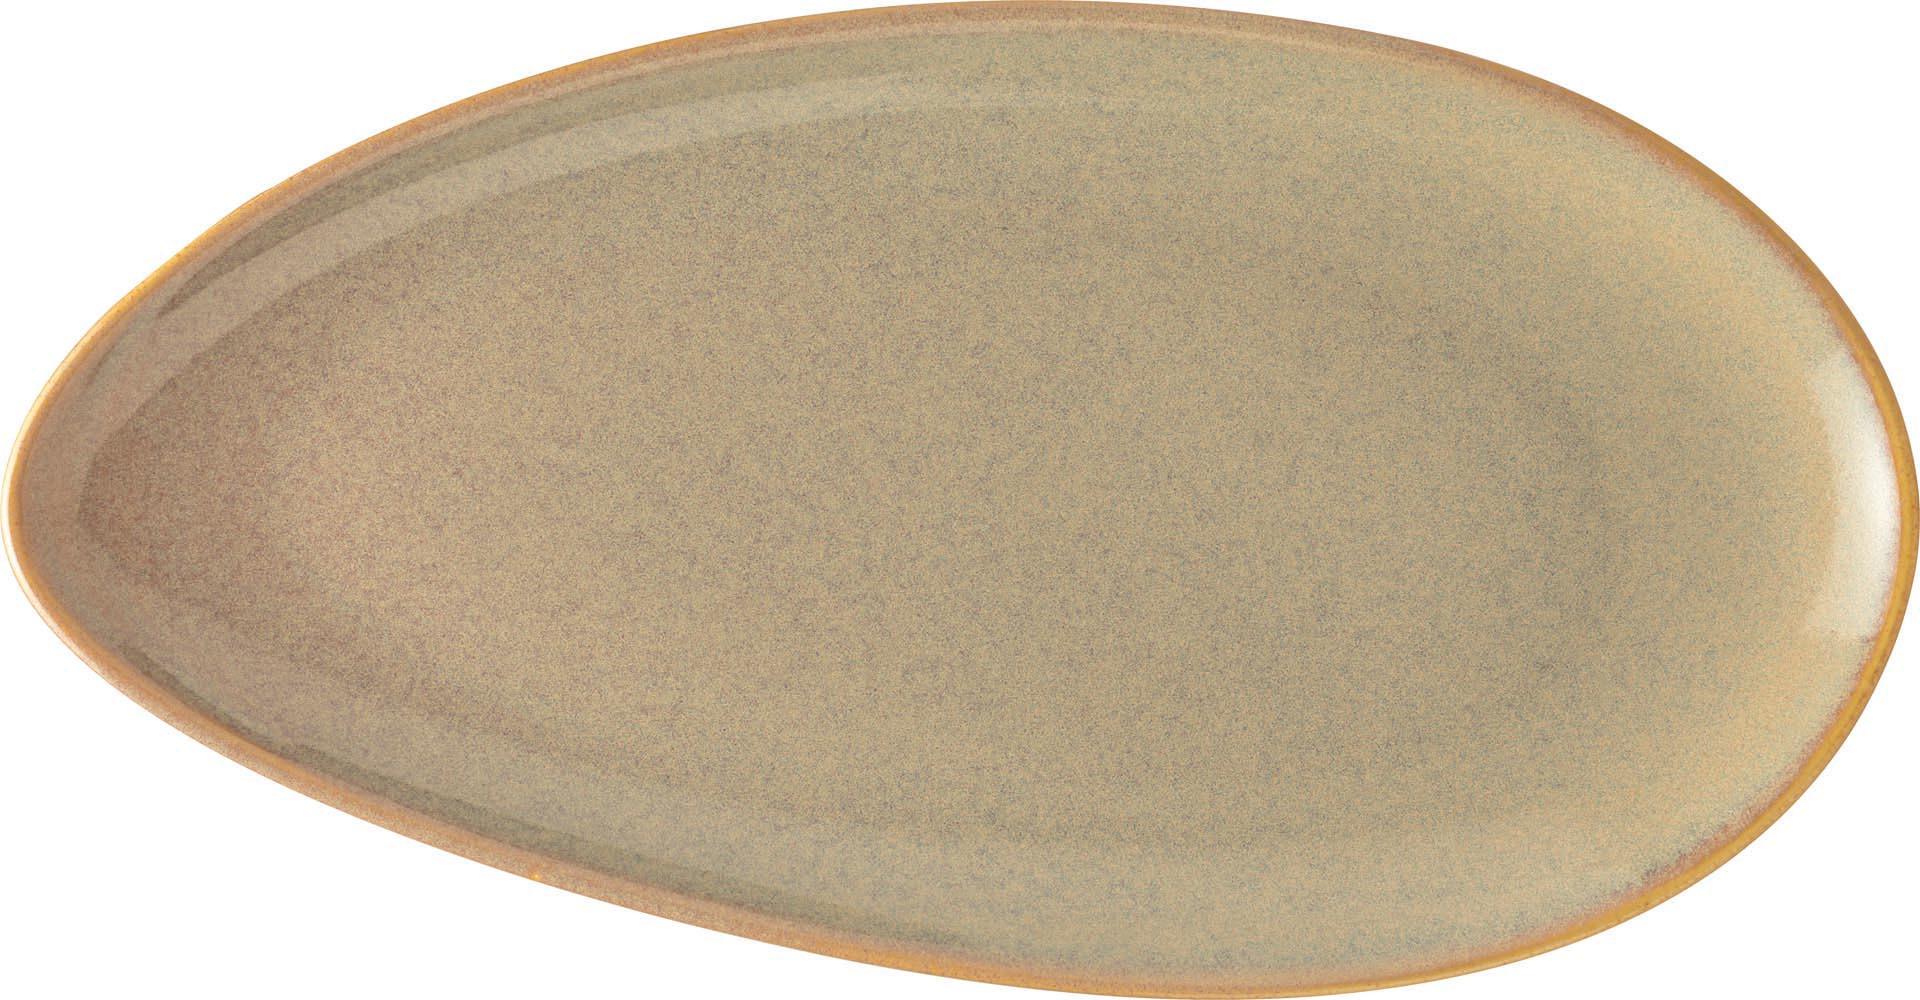 """Vida"" Platte flach oval"